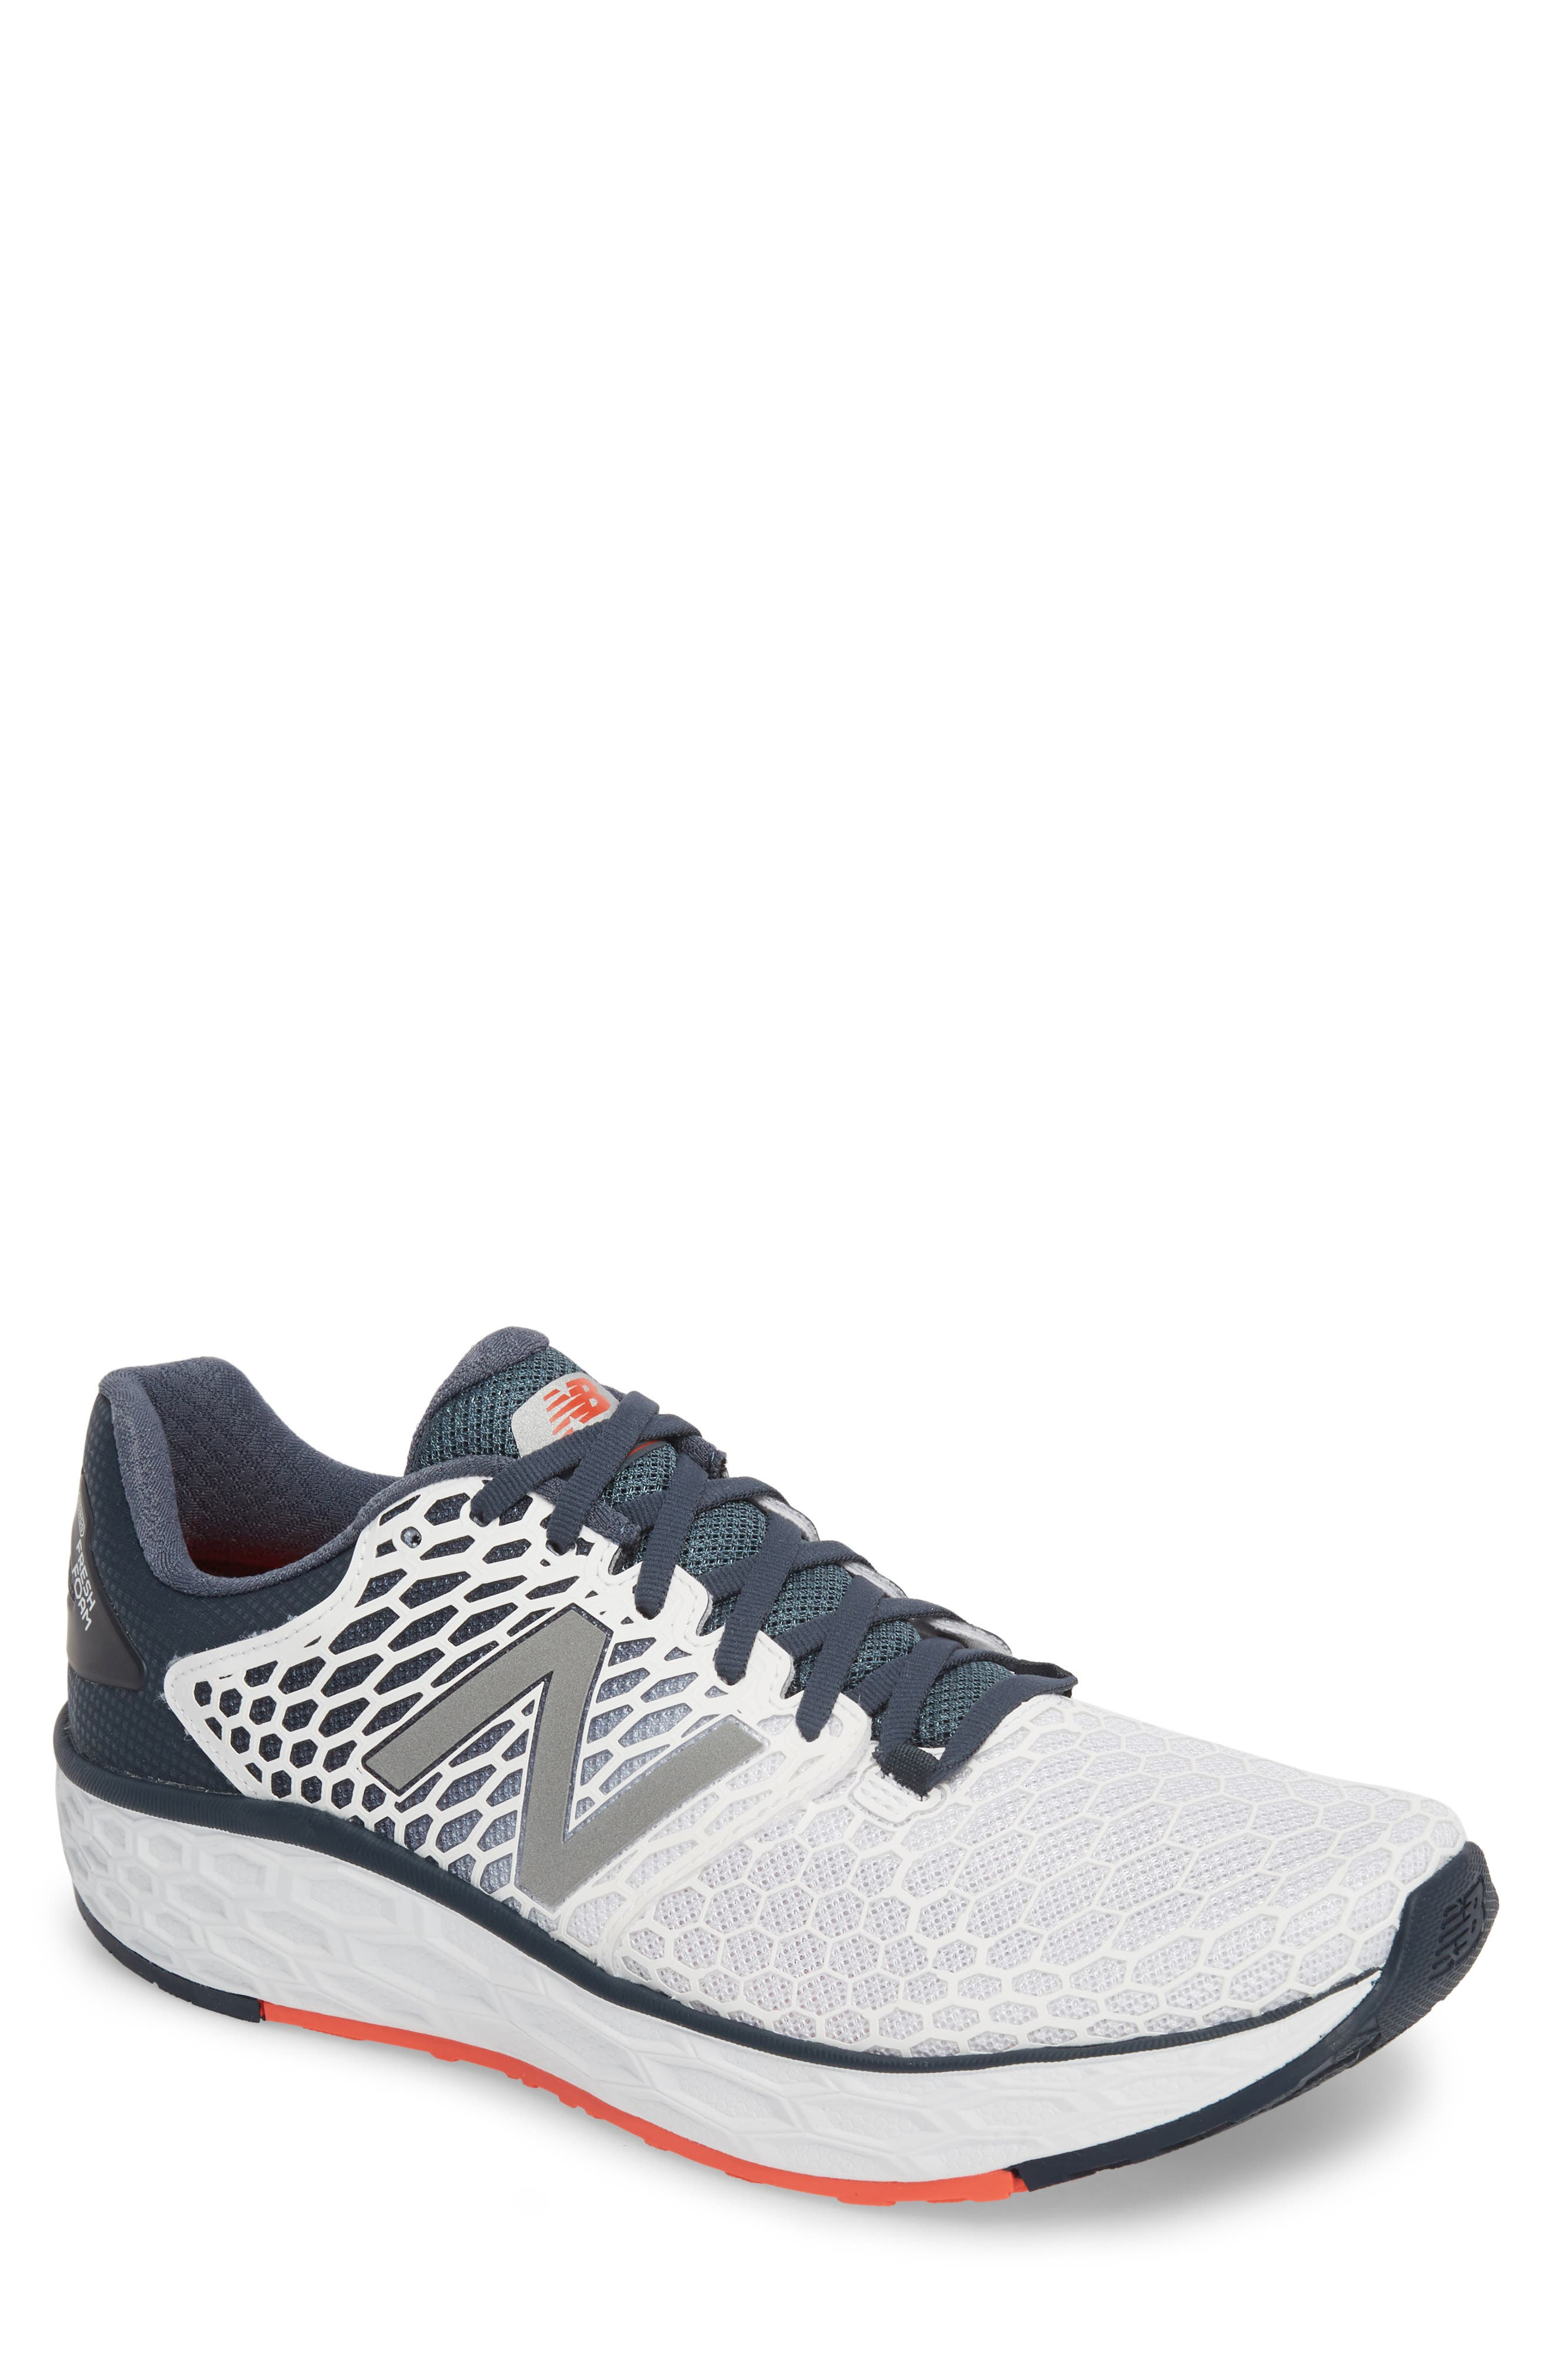 Fresh Foam Vongo v3 Running Shoe,                             Main thumbnail 1, color,                             White